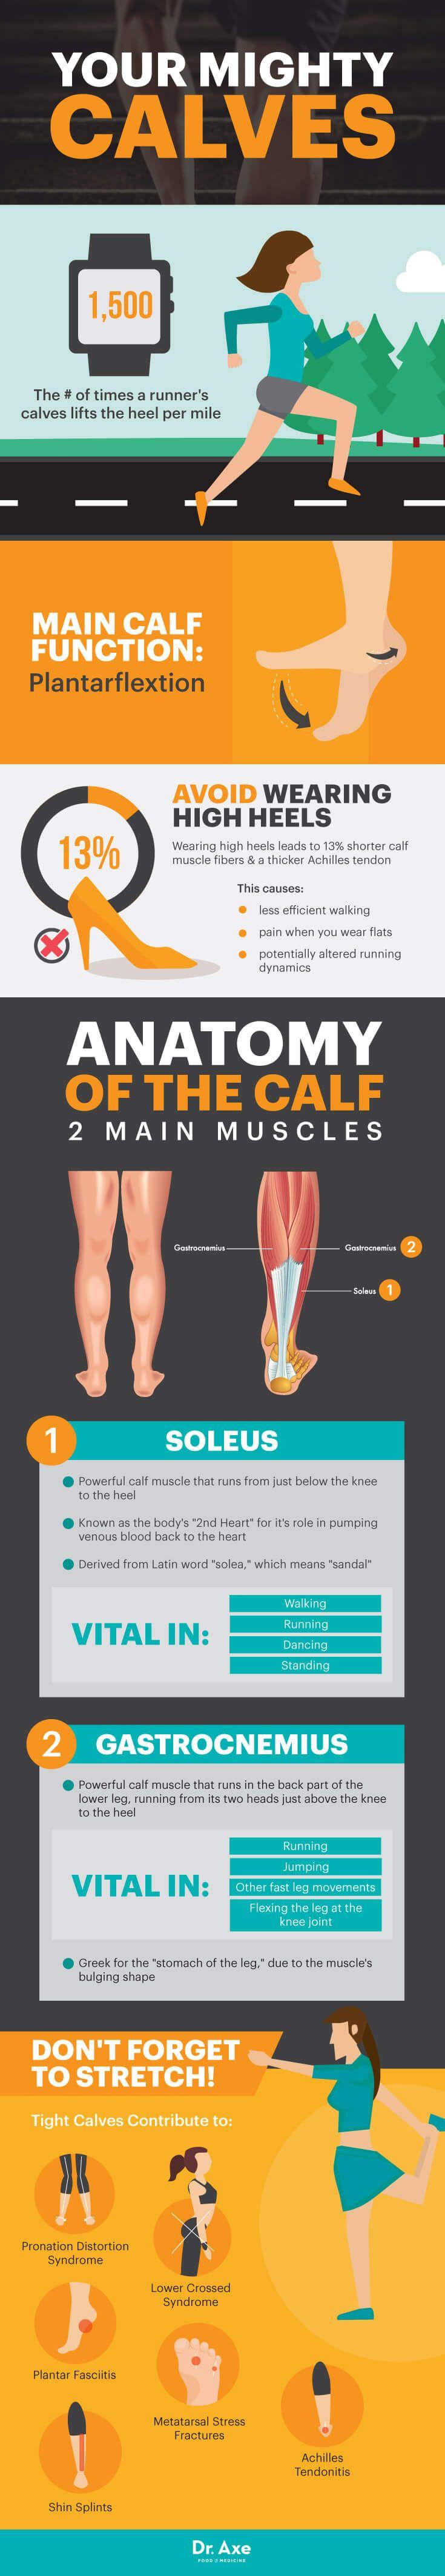 Calf exercises - Dr. Axe http://www.draxe.com #health #holistic #natural